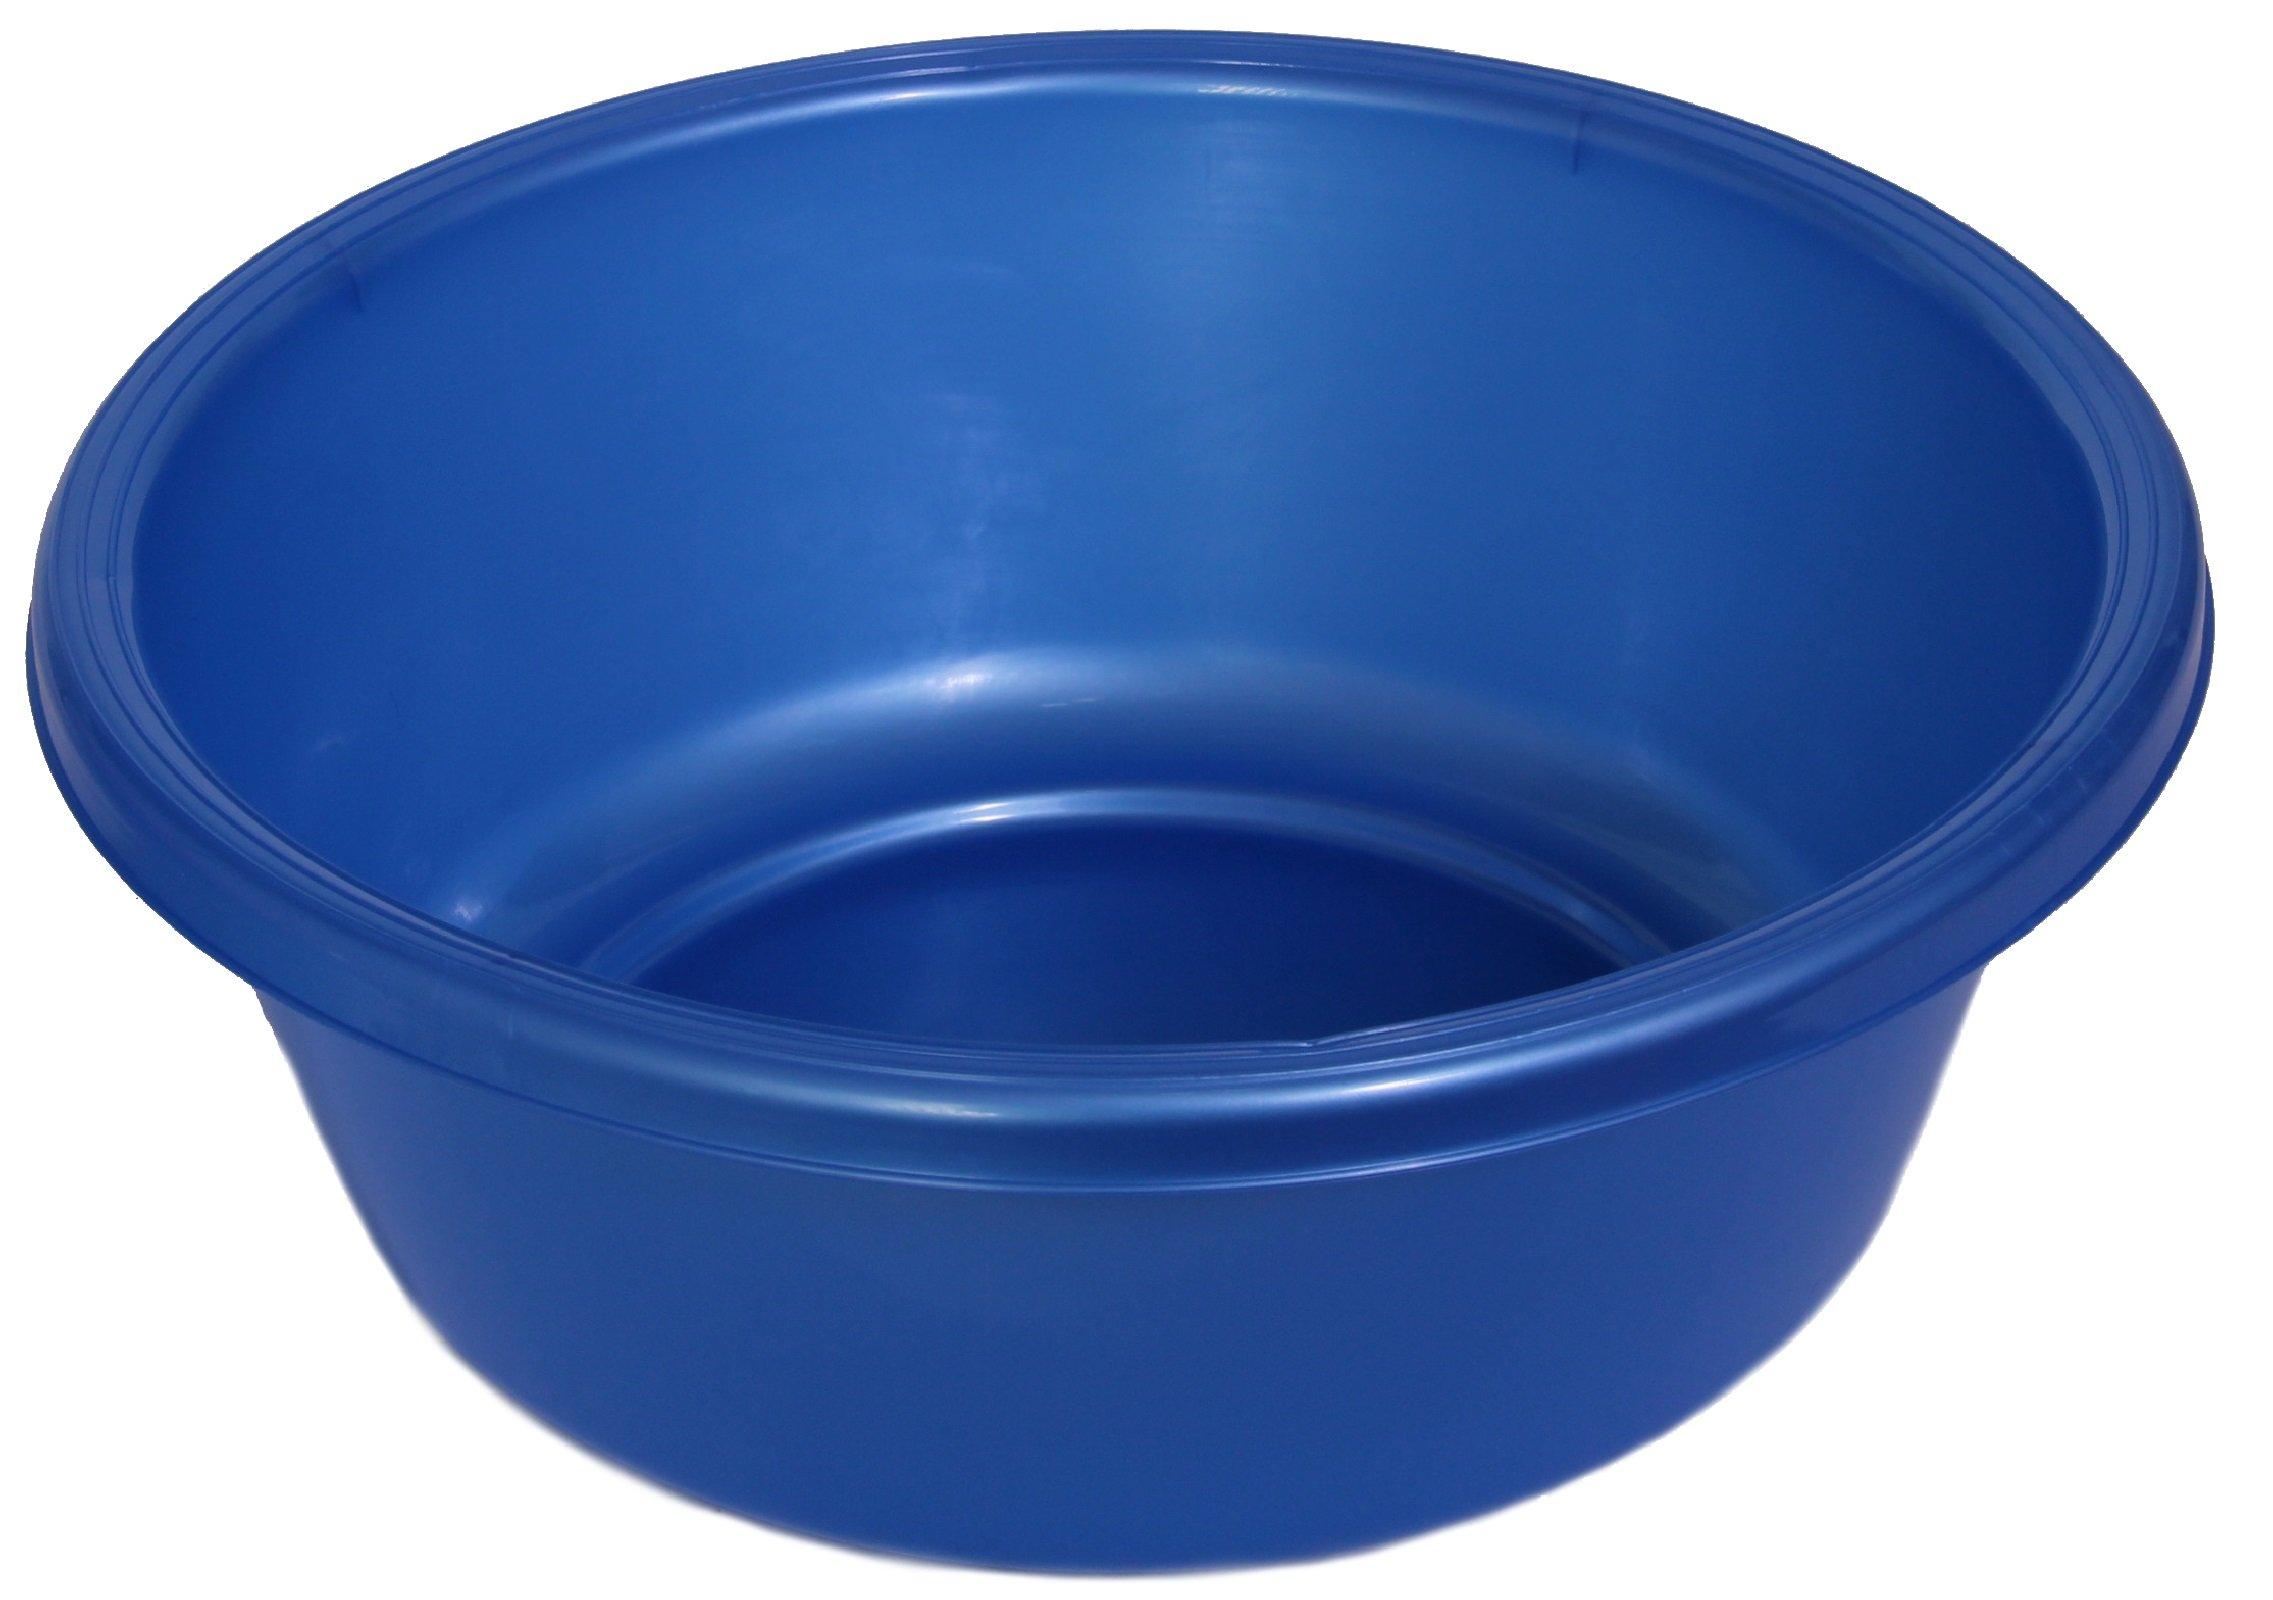 Ybm Home Round Plastic Wash Basin 1148 11.25'' COLOR MAY VARY